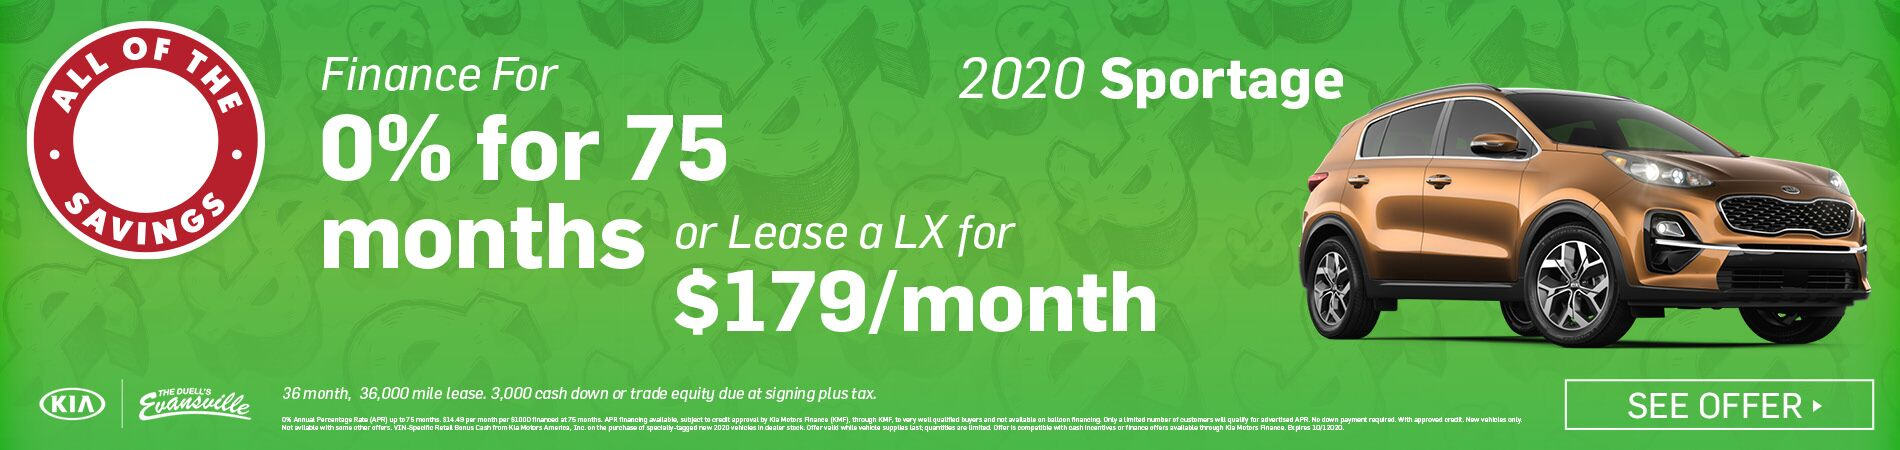 2020 Kia Sportage Special Offer